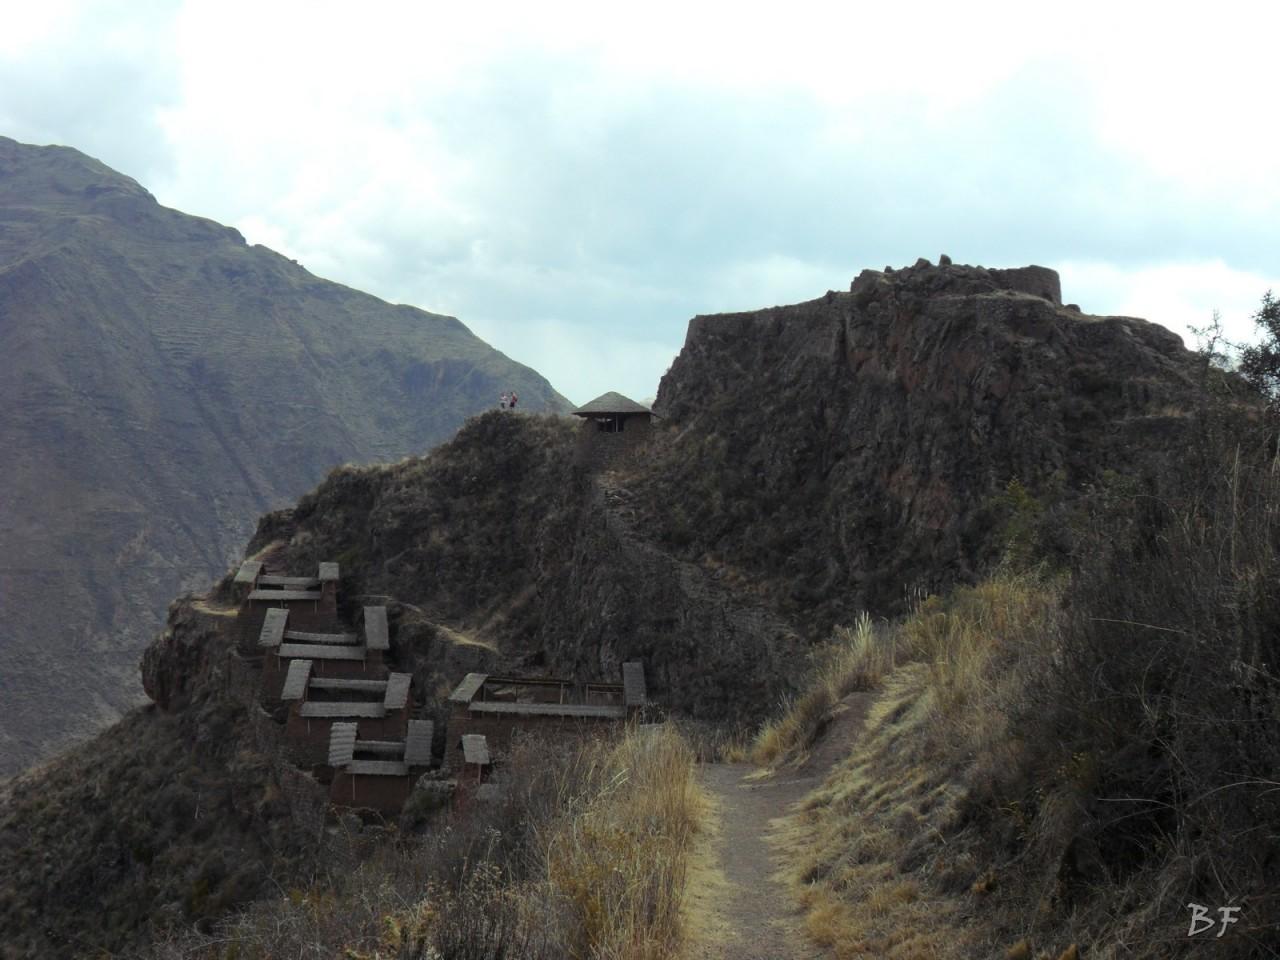 Mura-Poligonali-Megaliti-Altari-Rupestri-Pisac-Cusco-Perù-79